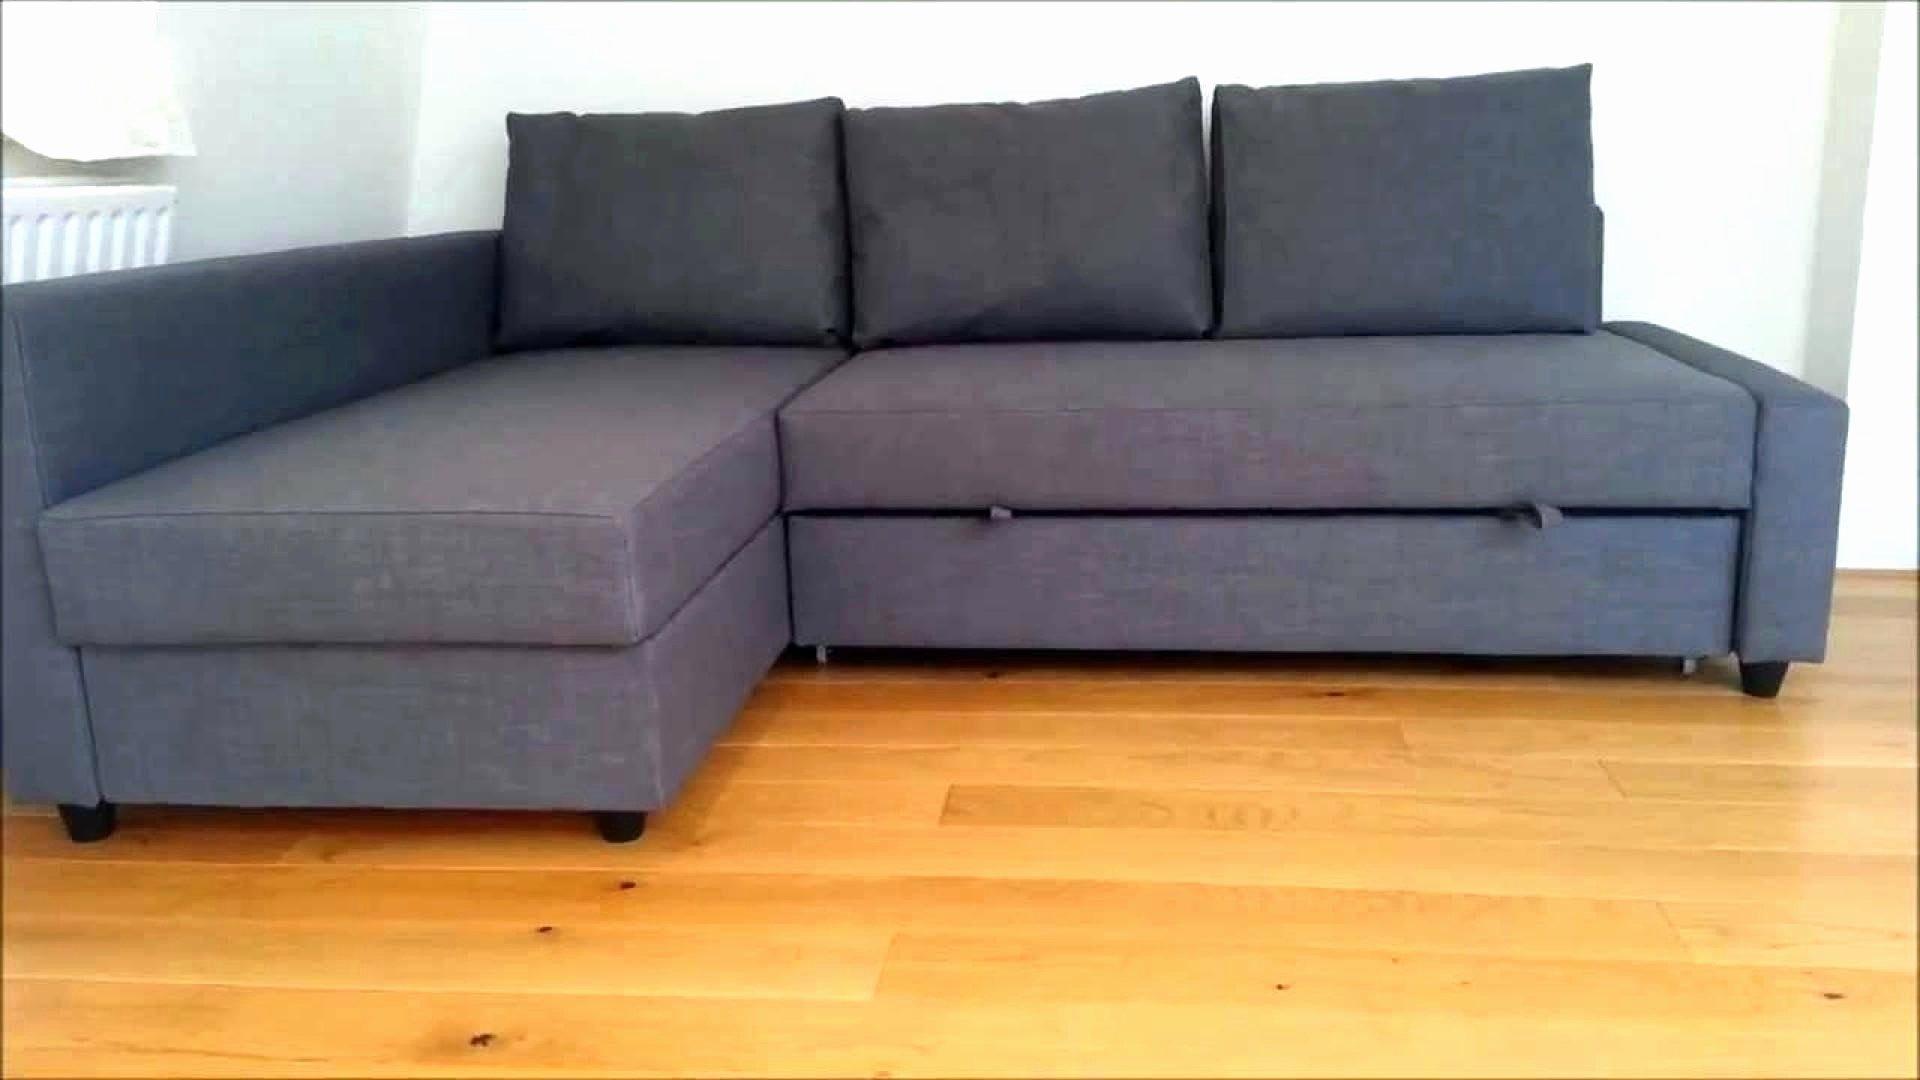 Ikea Canape Angle Convertible Beau Galerie √ Bout De Canap Ikea Excellent Ikea Matelas Pour Canape Convertible